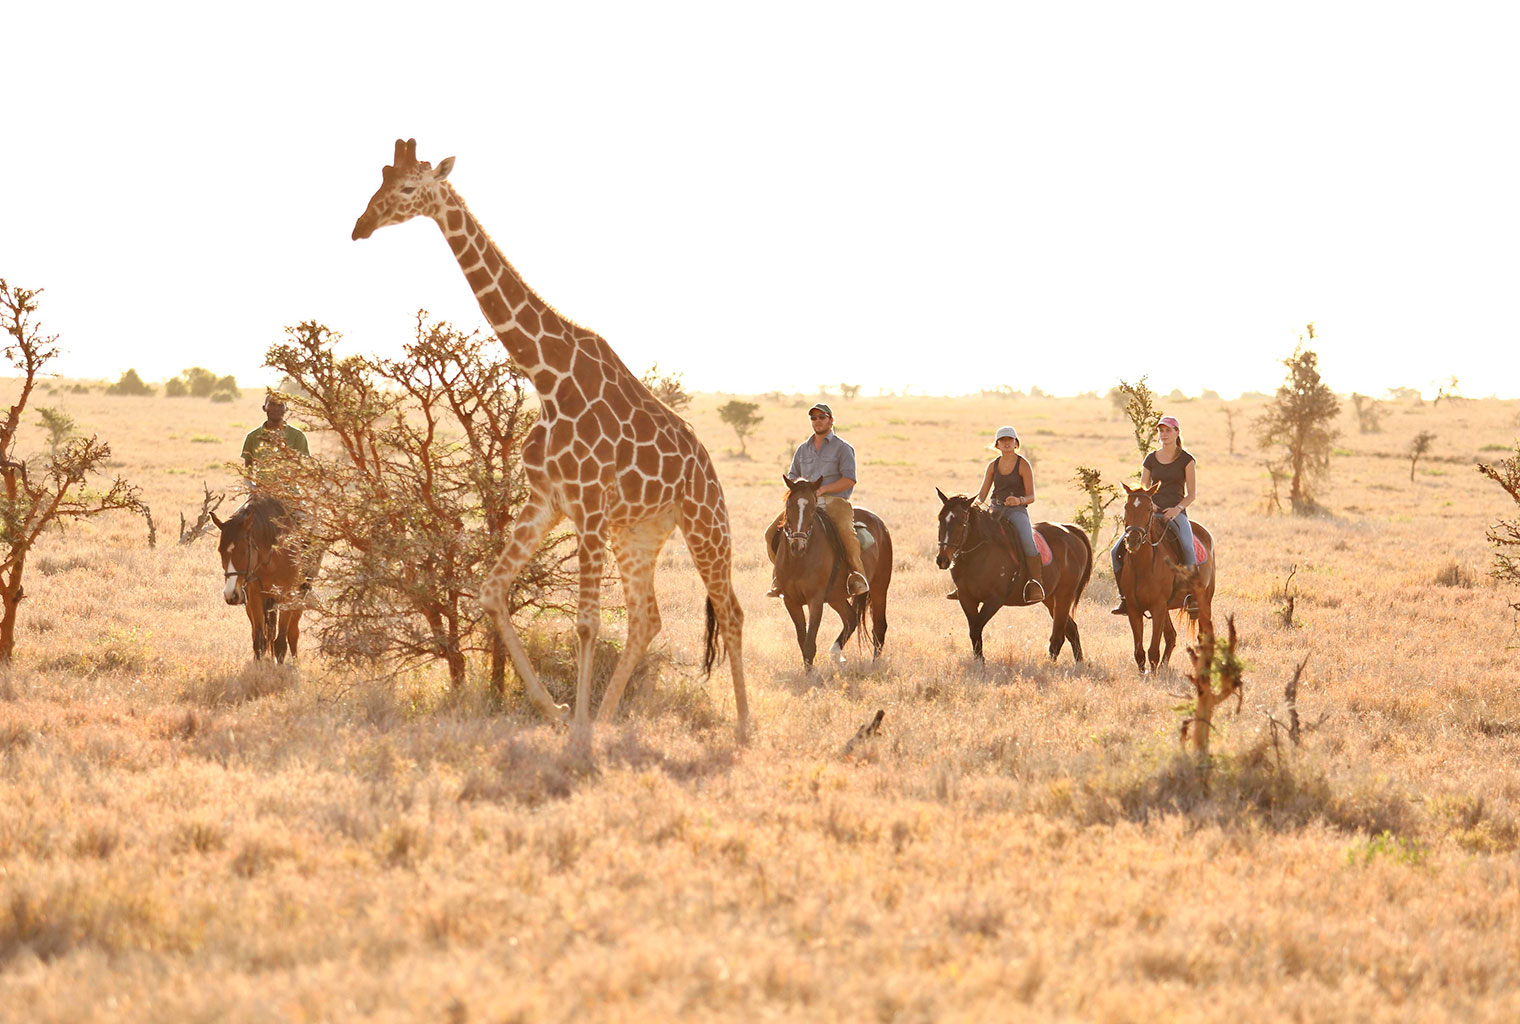 Lewa-Wilderness-Kenya-Horse-Riding-Wildlife